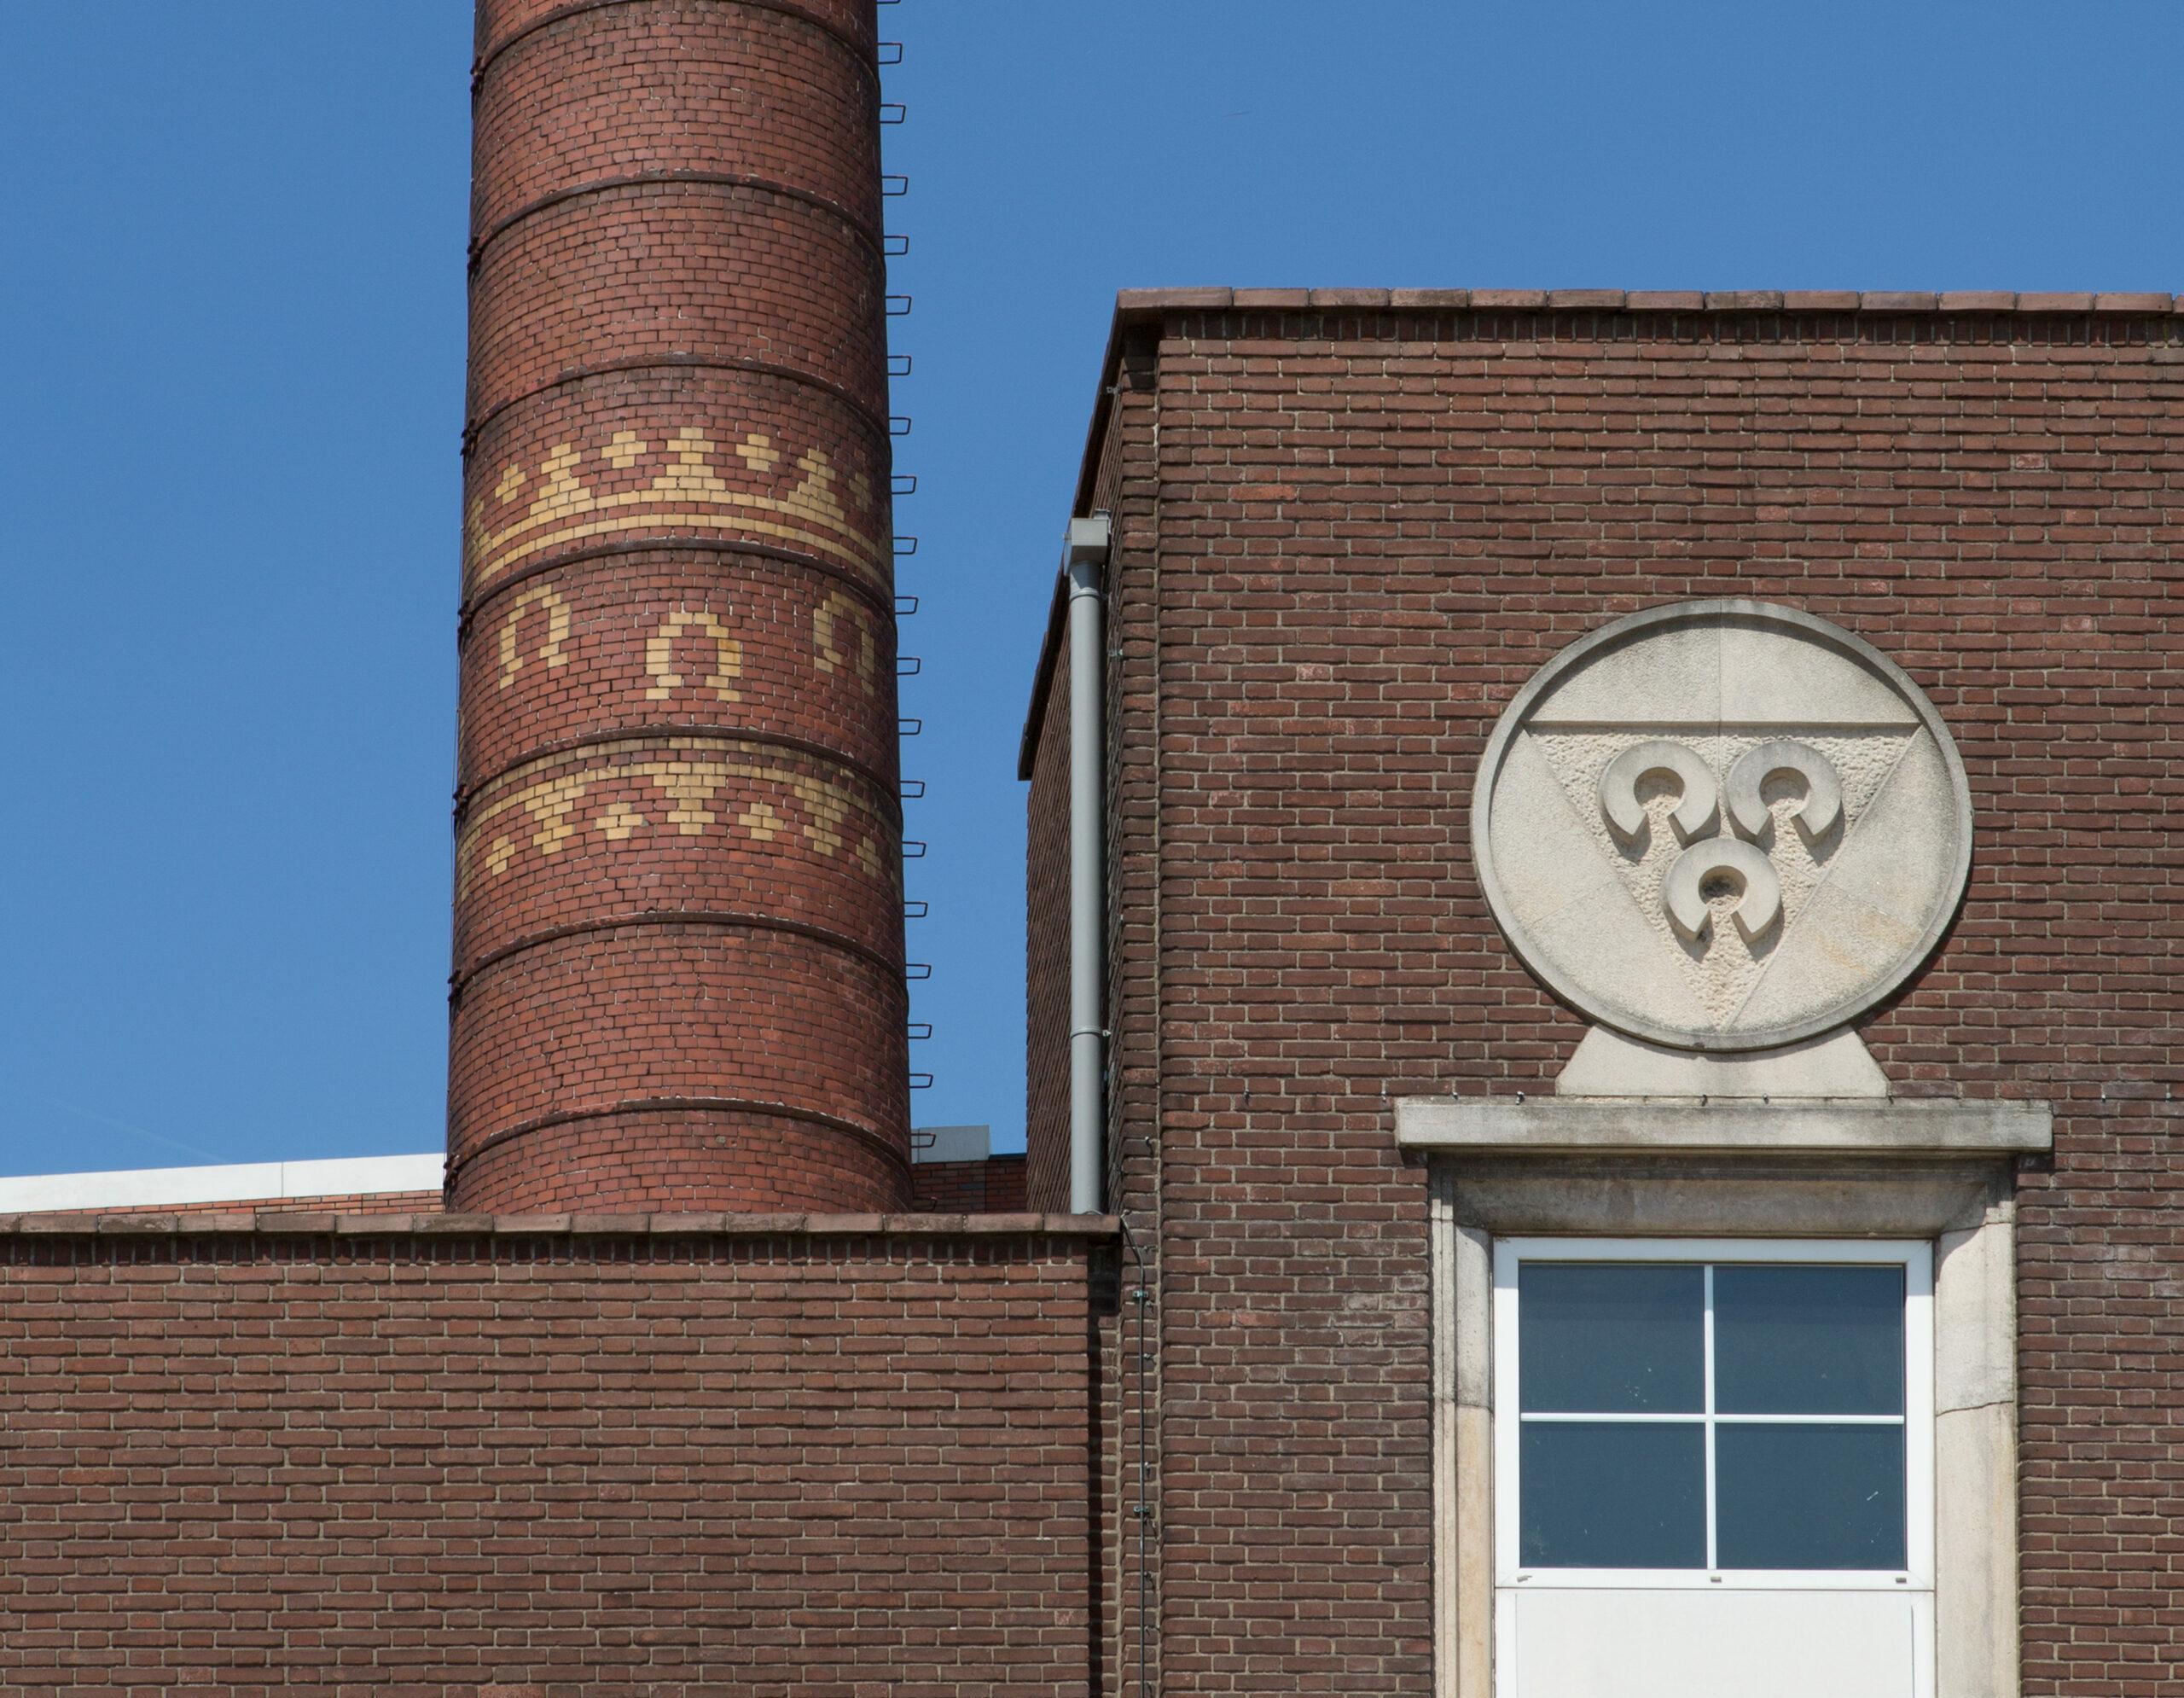 Trappenhuis Brouwhuis Breda